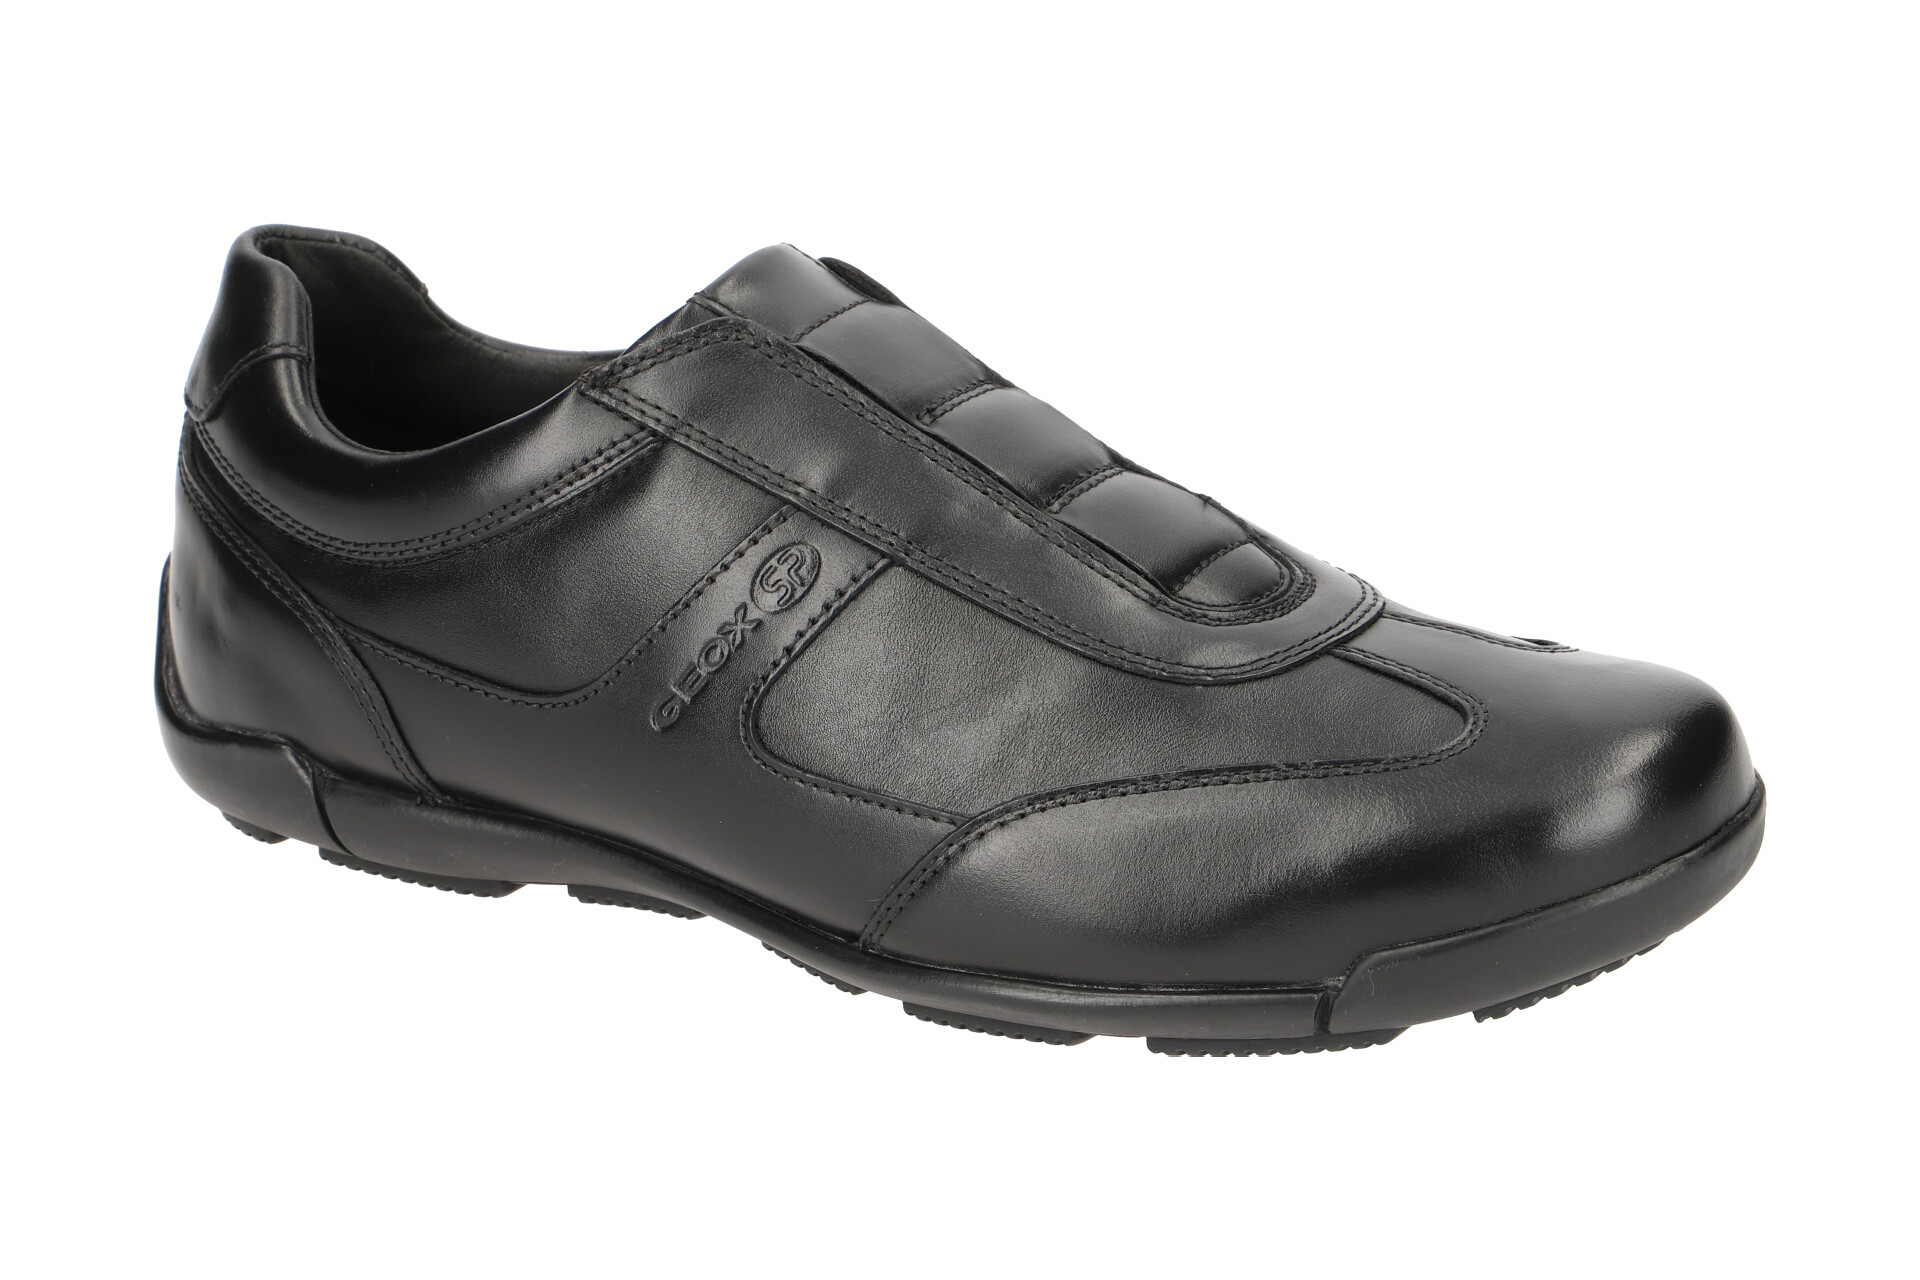 Details about Geox Schuhe EDGWARE schwarz Herrenschuhe elegante Slipper U923BB 043BC C9999 NEU